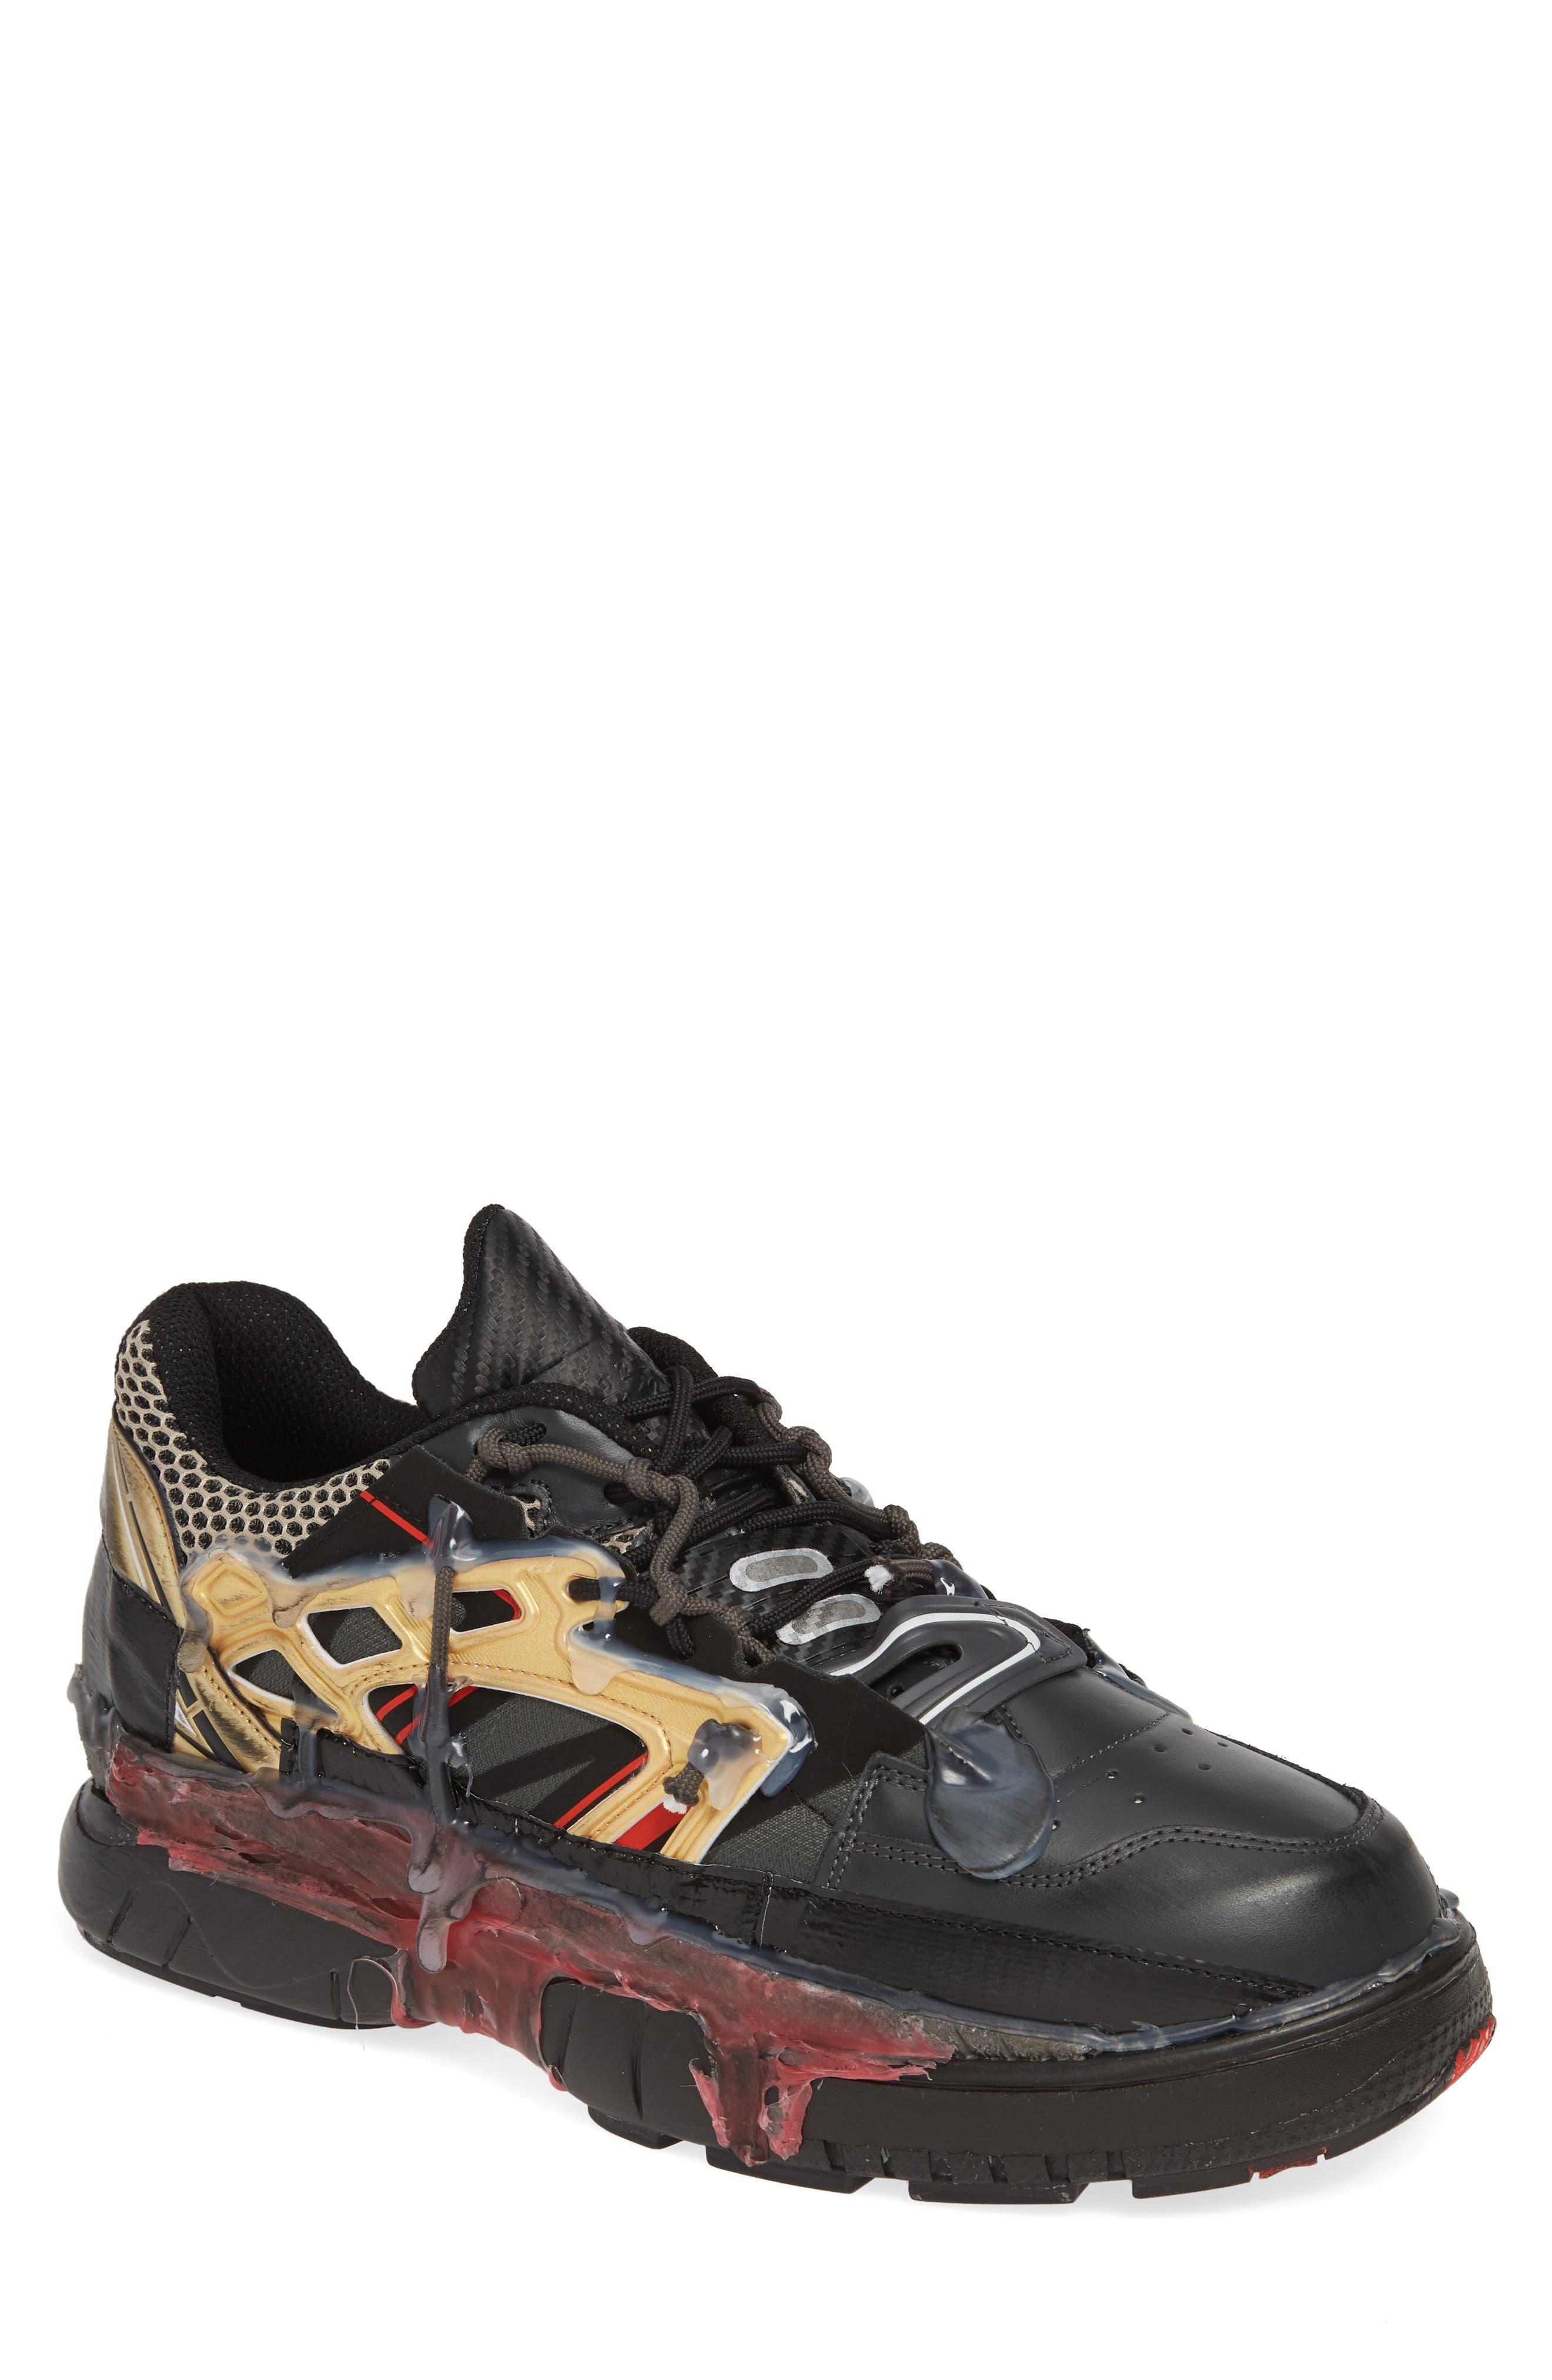 MM6 MAISON MARGIELA,                             Maison Margiela Fusion Sneaker,                             Main thumbnail 1, color,                             BLACK/ GOLD/ RED